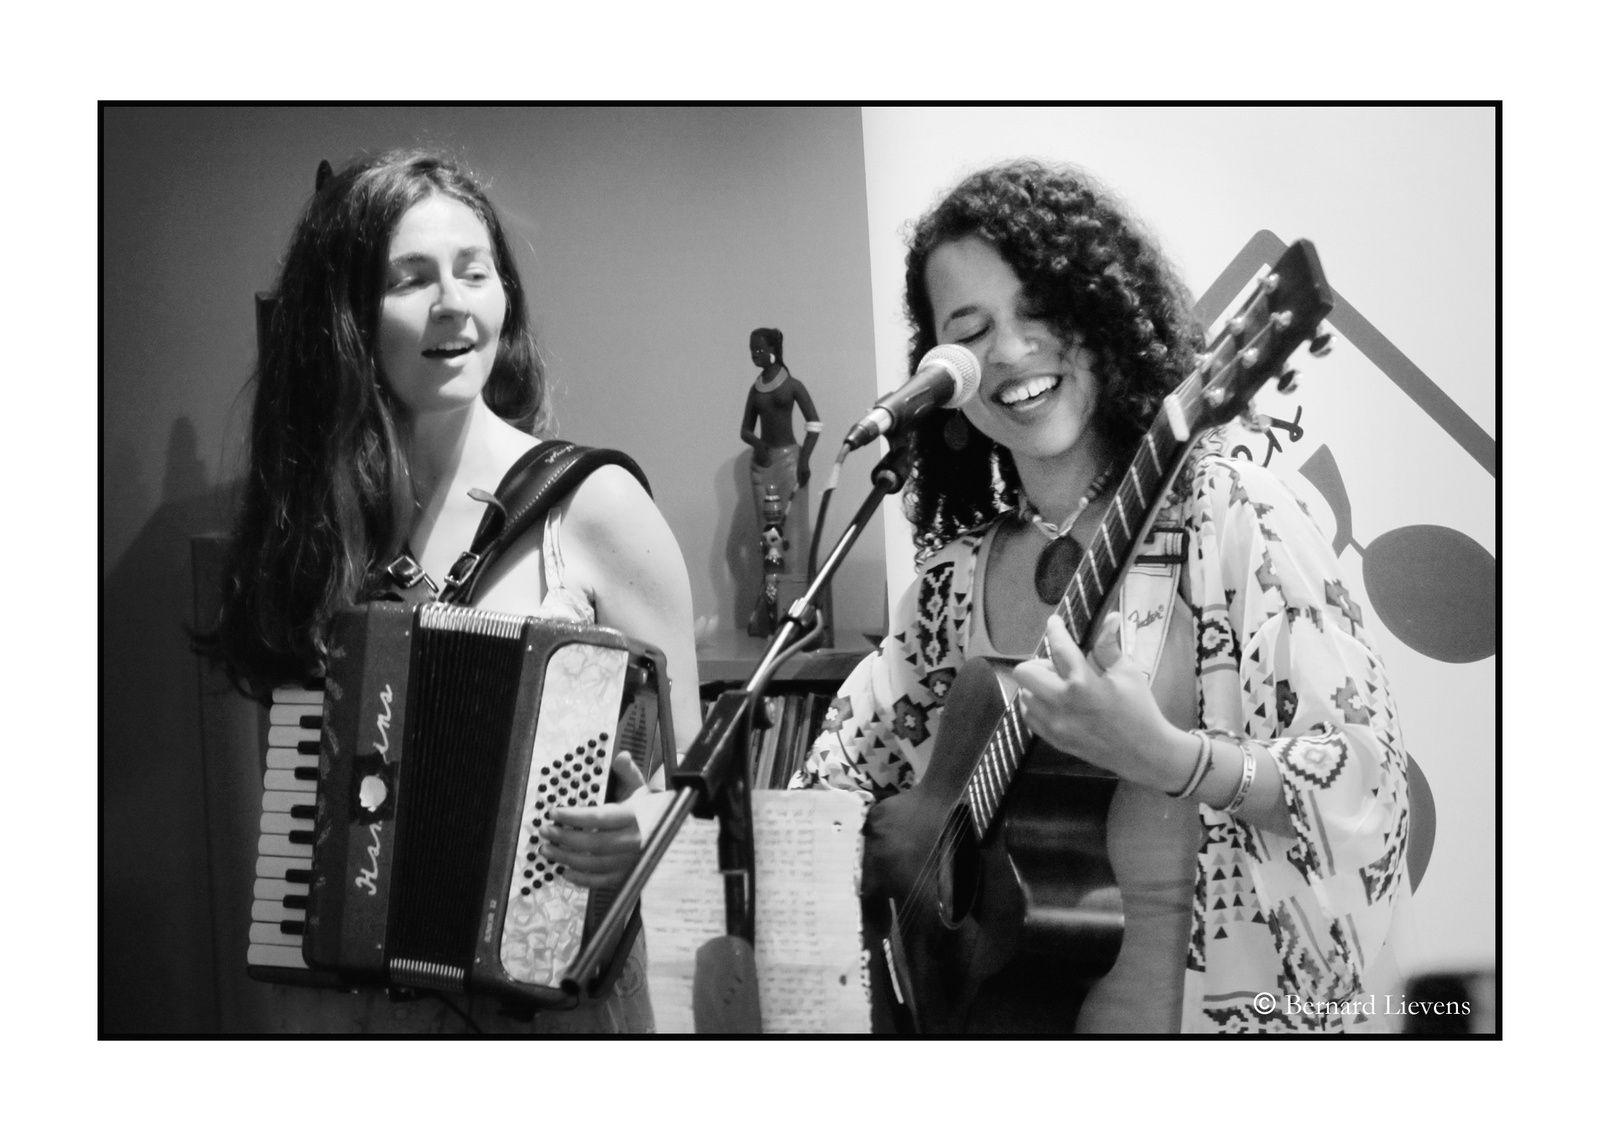 ▶ Photos - Shelby Ouattara @ Home concerts Soirées Cerises / Drogenbos - 21/07/2019